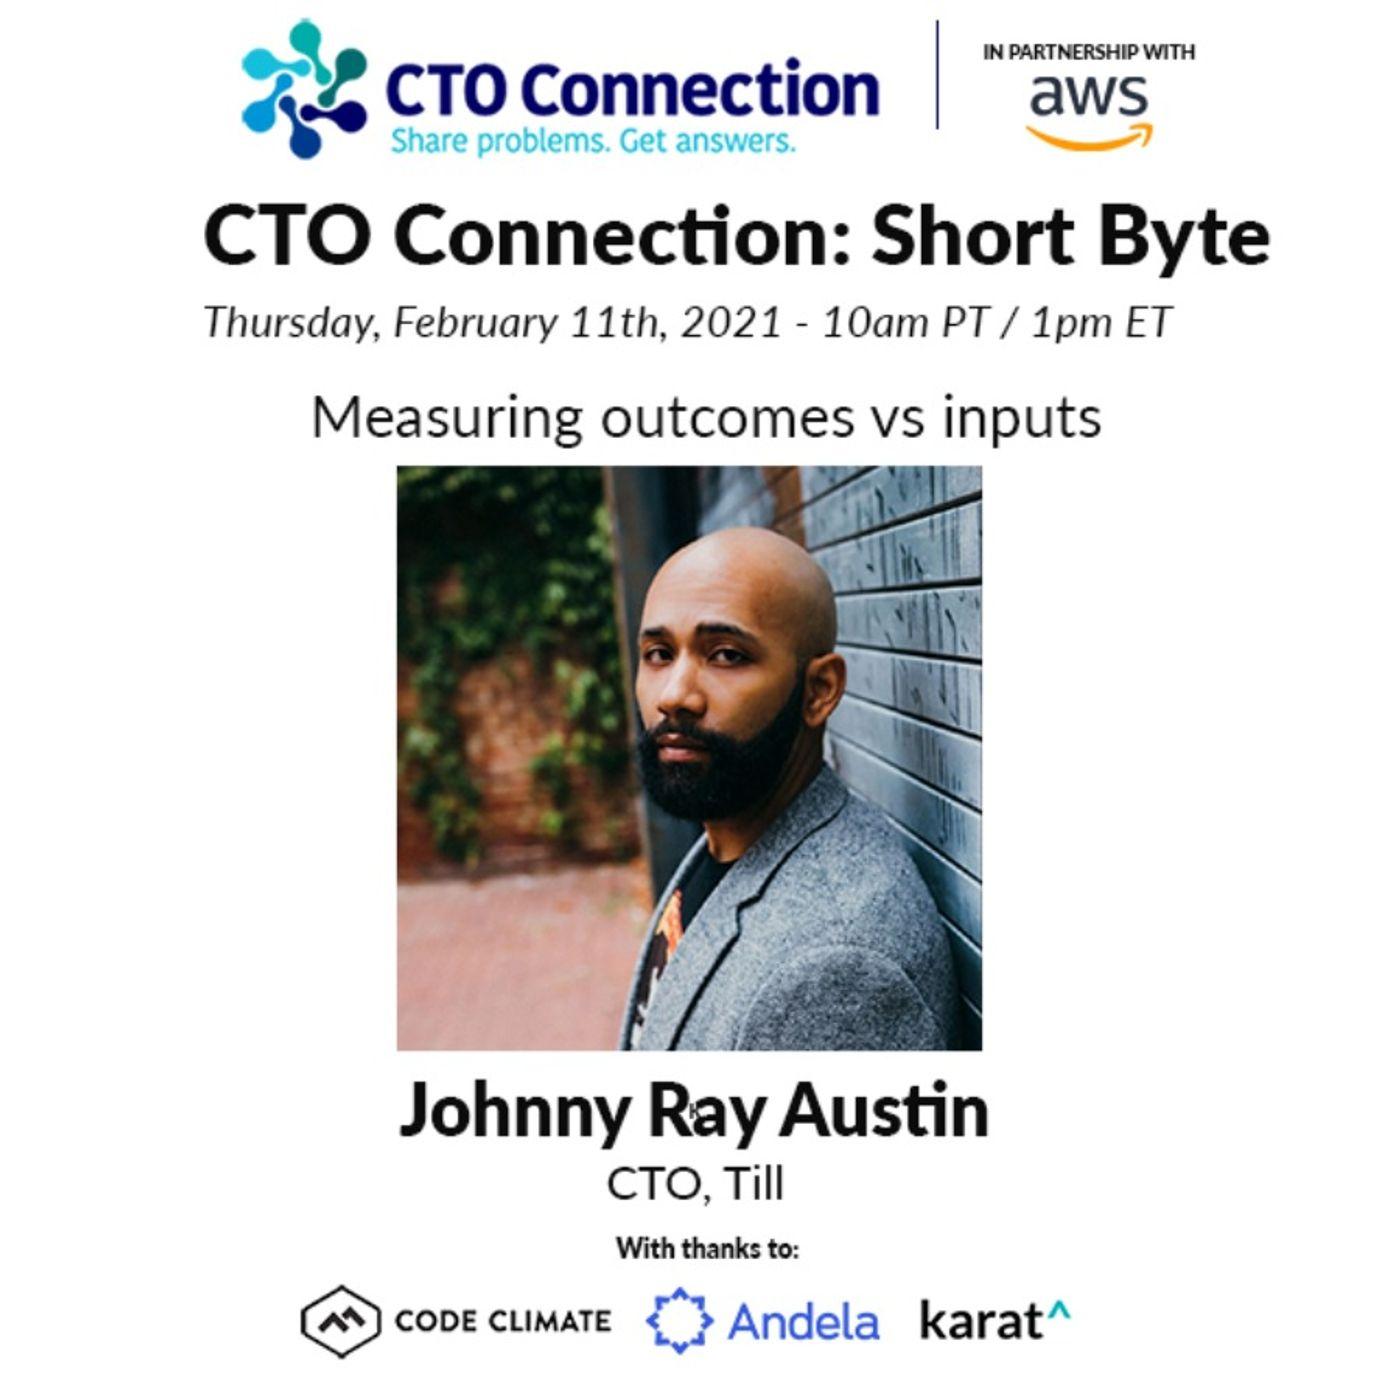 Short Byte: Johnny Ray Austin Measuring outcomes vs. inputs